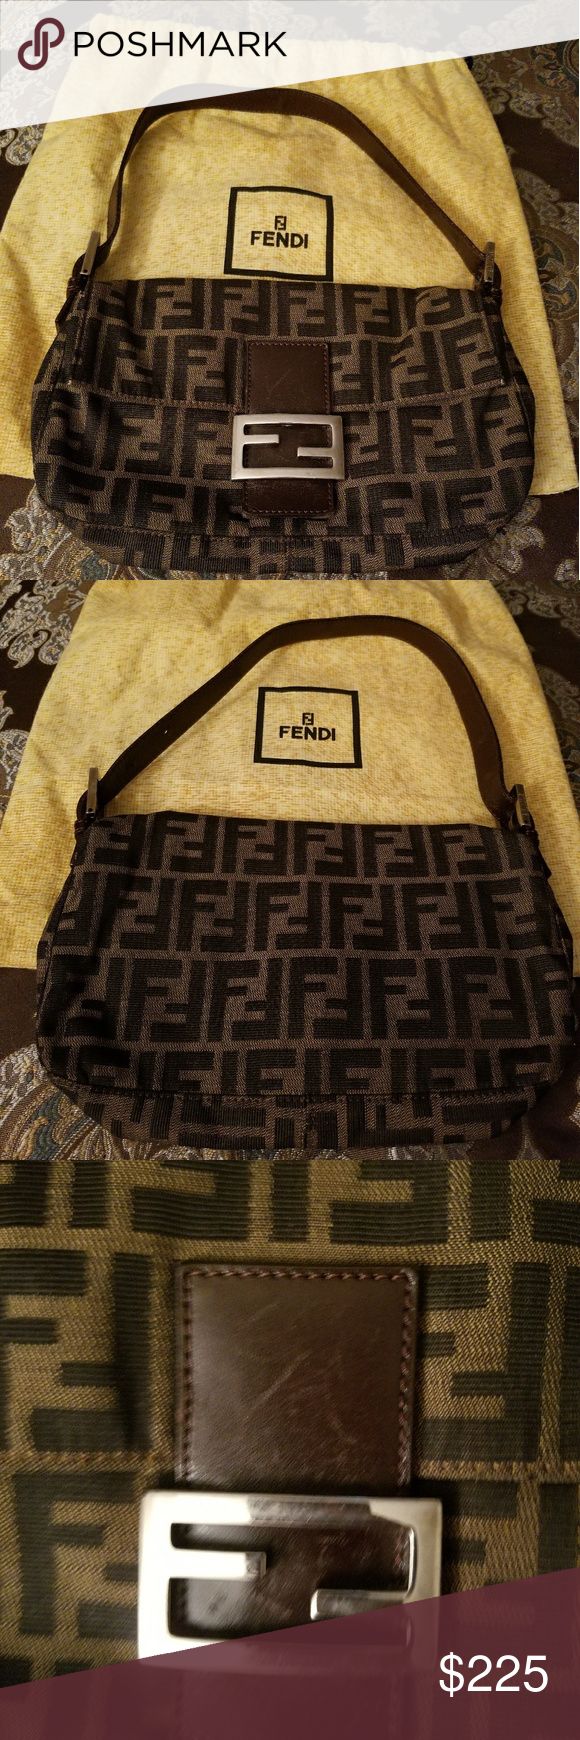 Vintage Fendi Zucca Baguette Bag Fendi Fendi Bags Bags